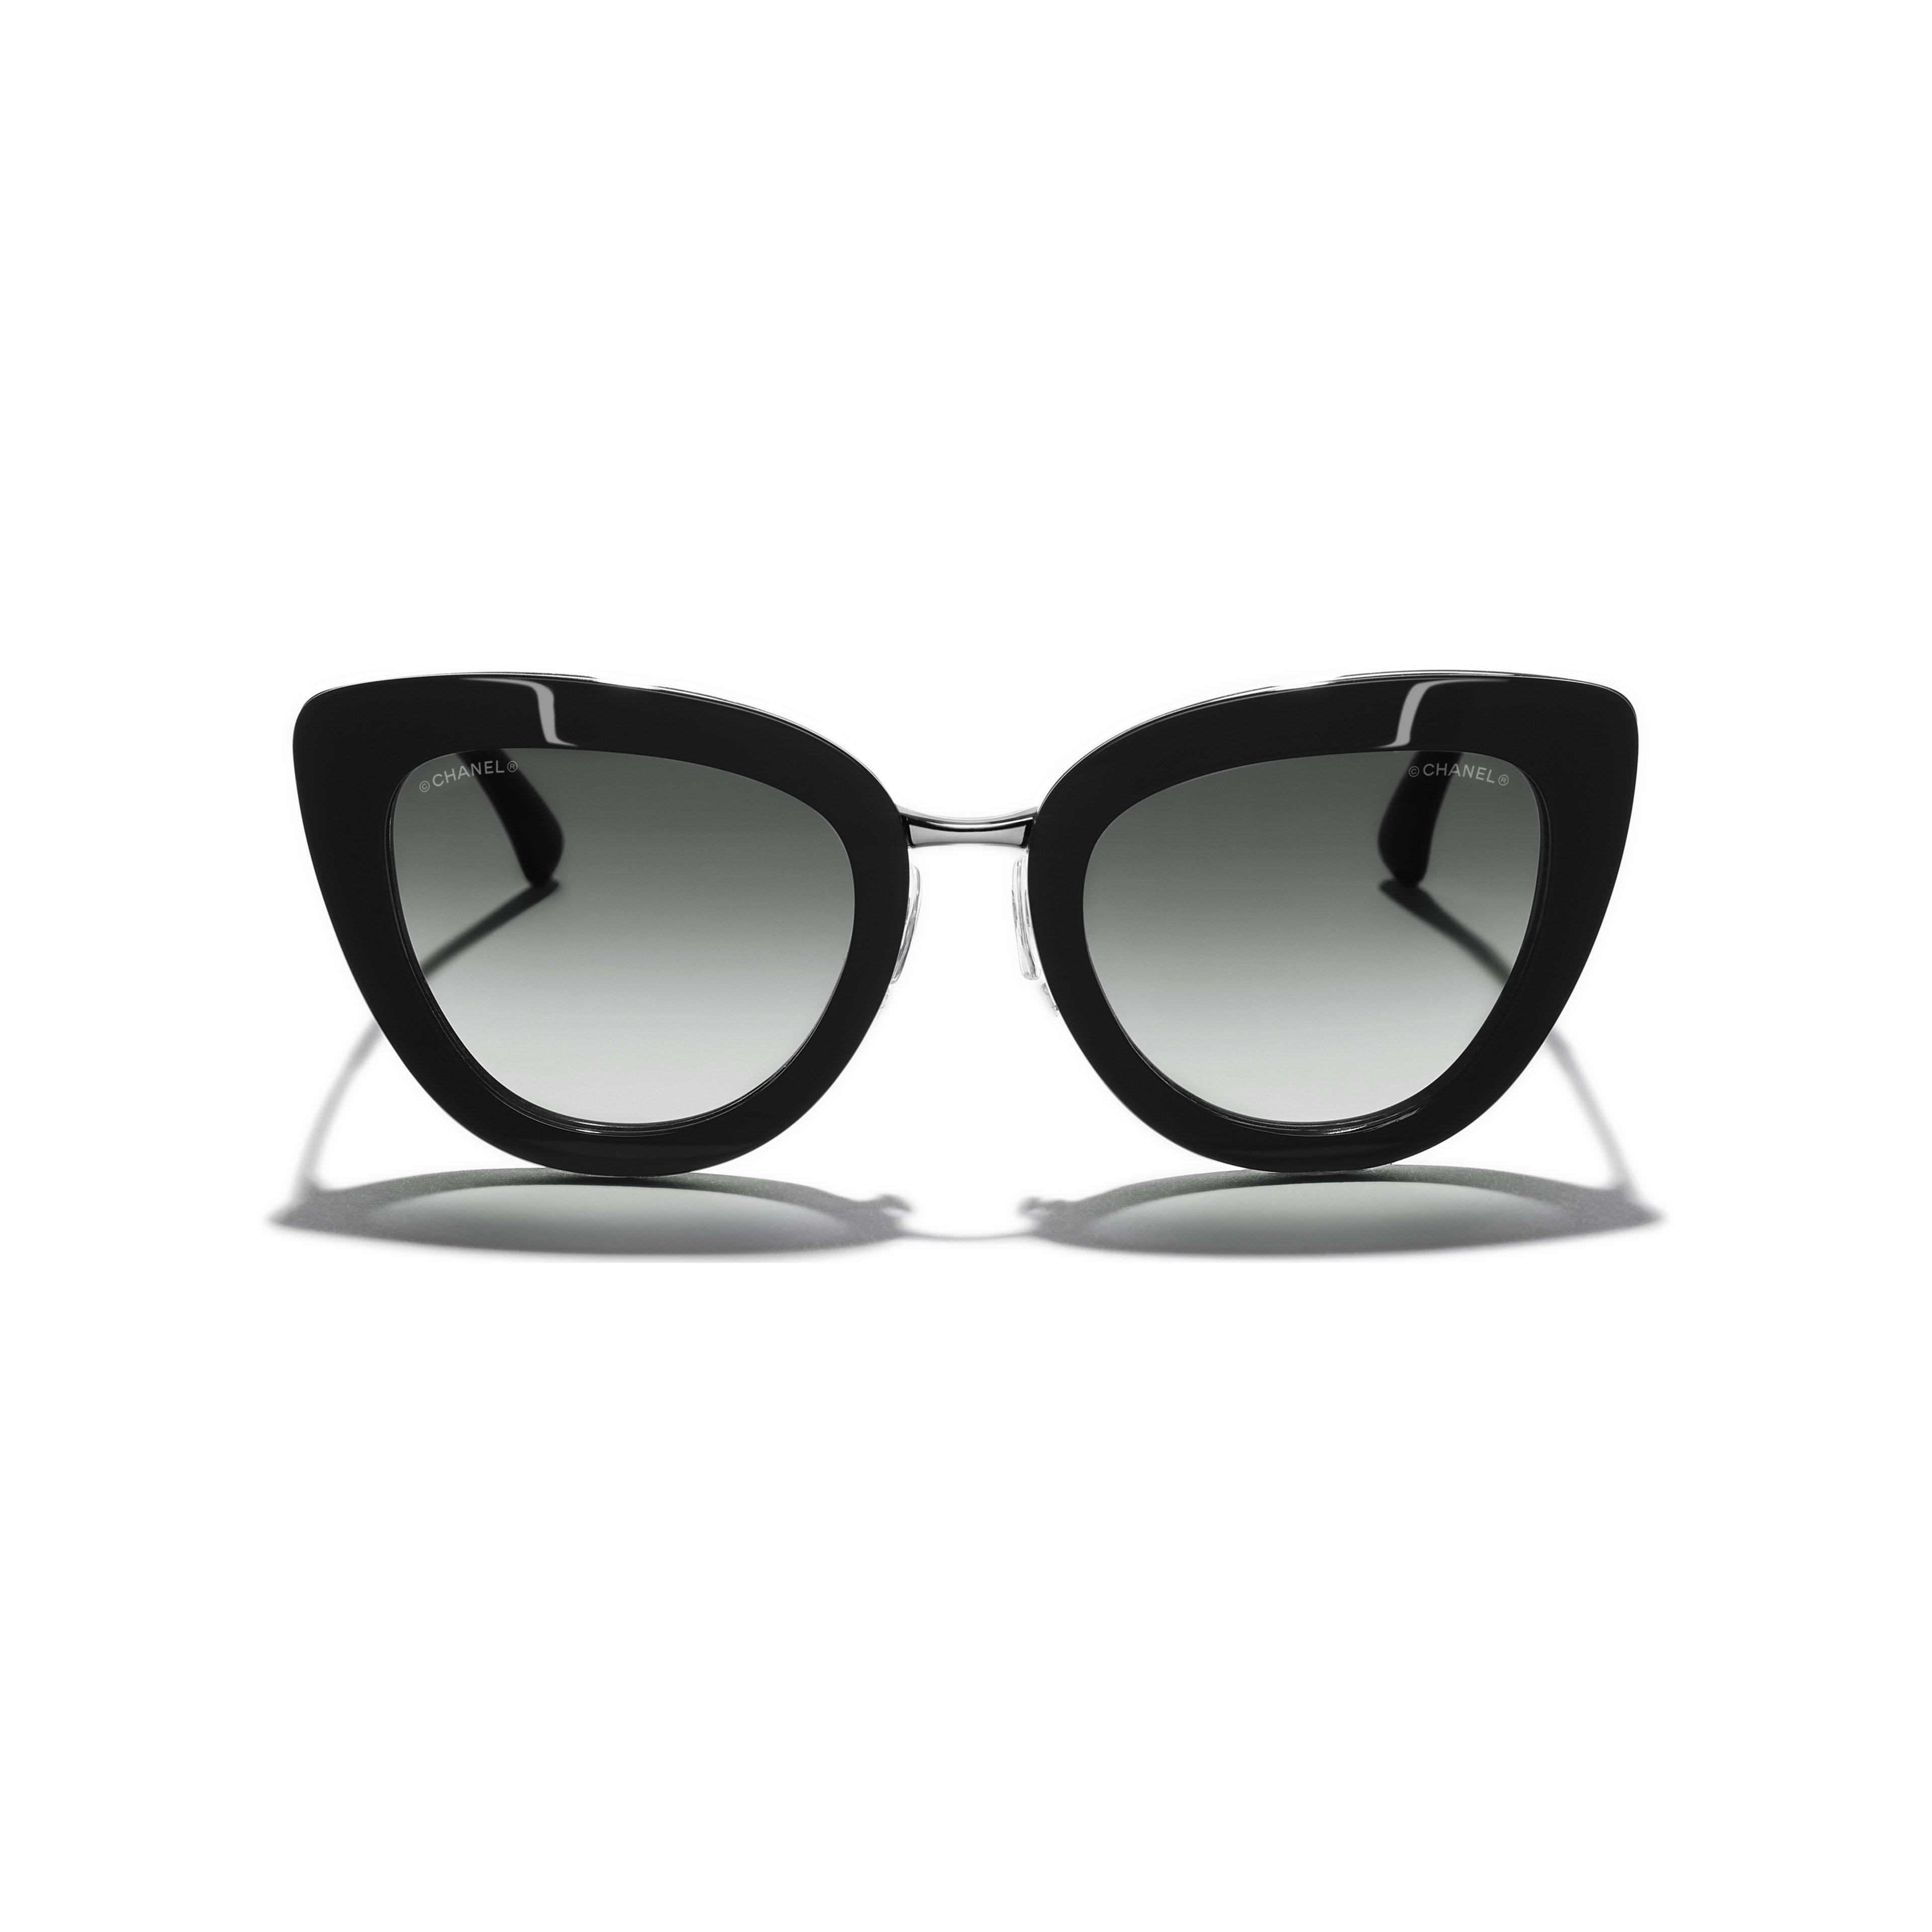 Cat Eye Sunglasses Acetate & Metal Black -                                                               view 1 - see full sized version